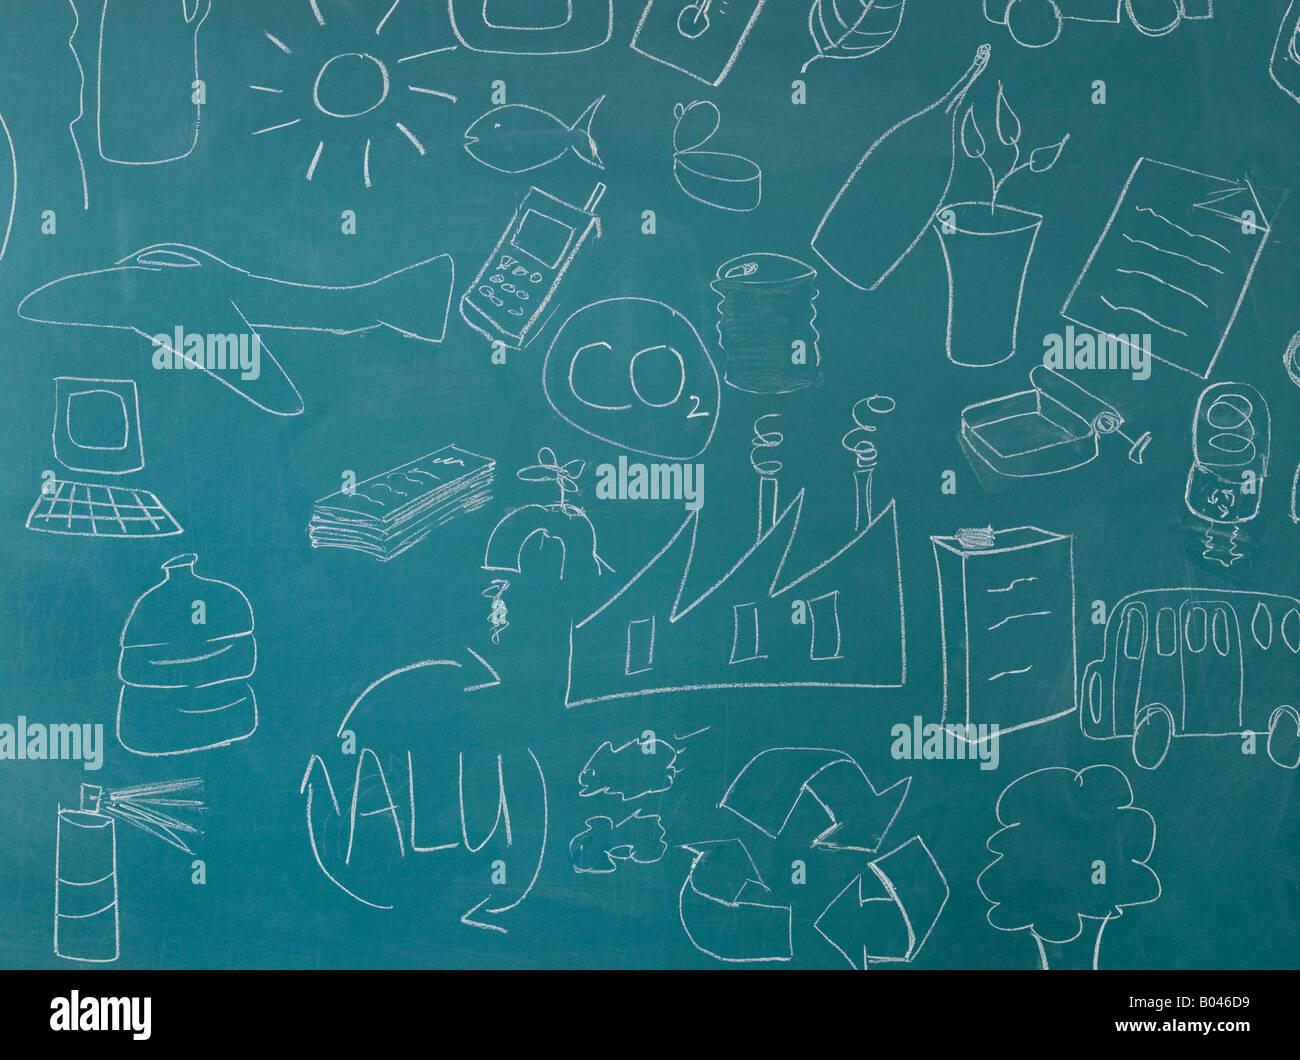 Recycling-Abbildungen auf Tafel Stockbild